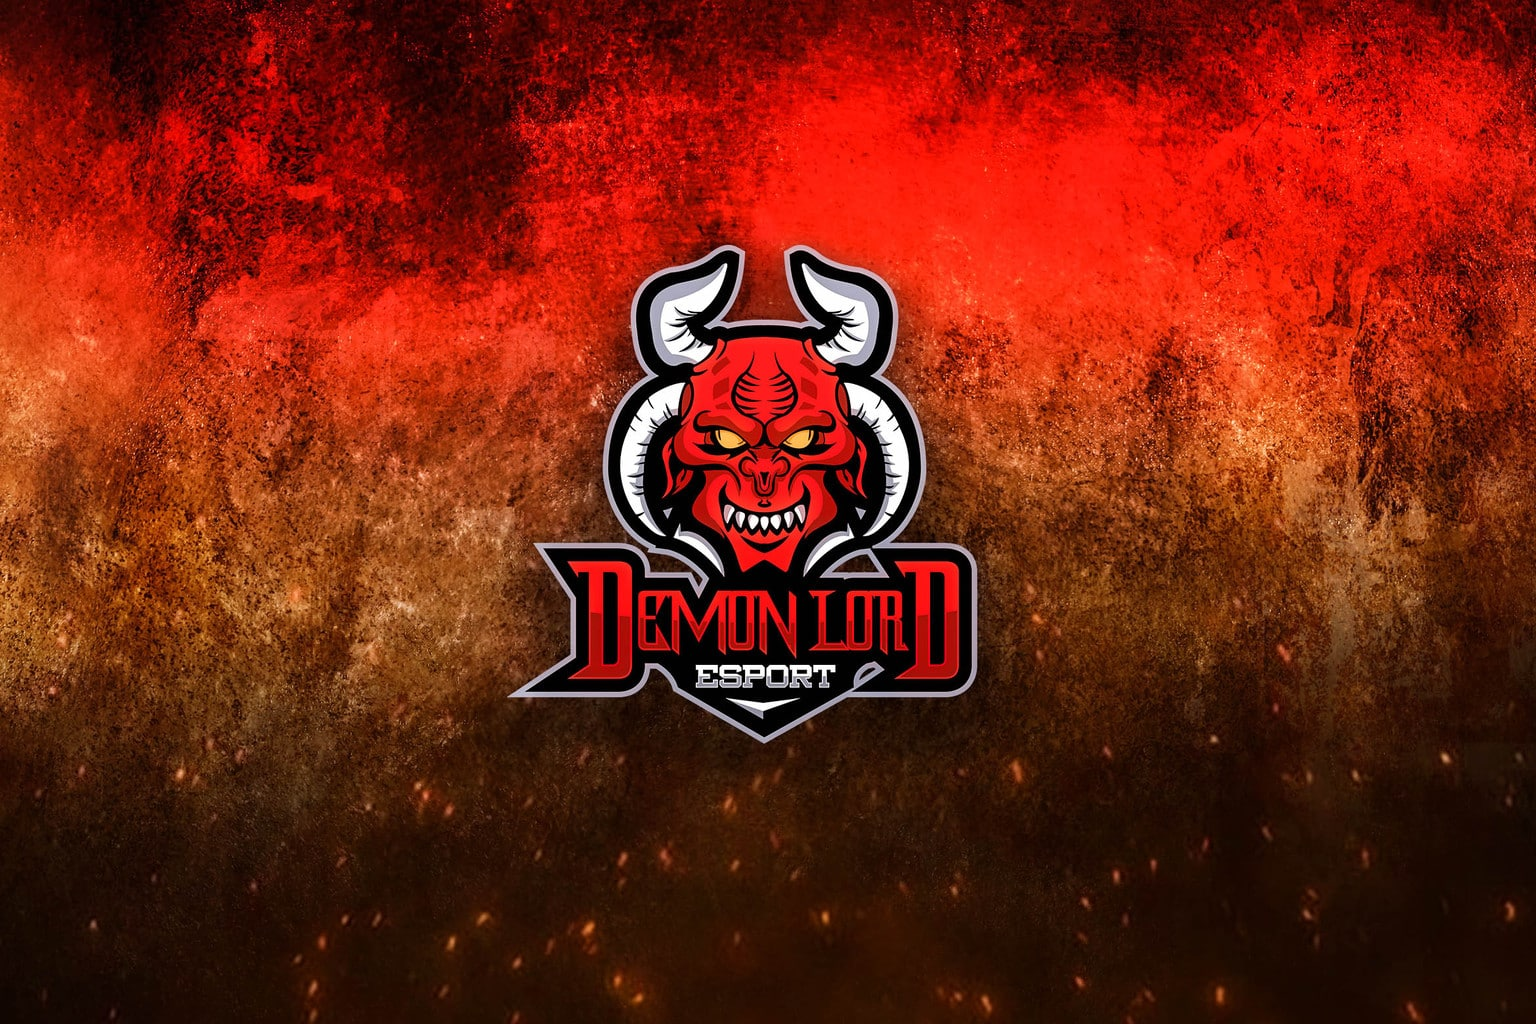 esport logo demon lord